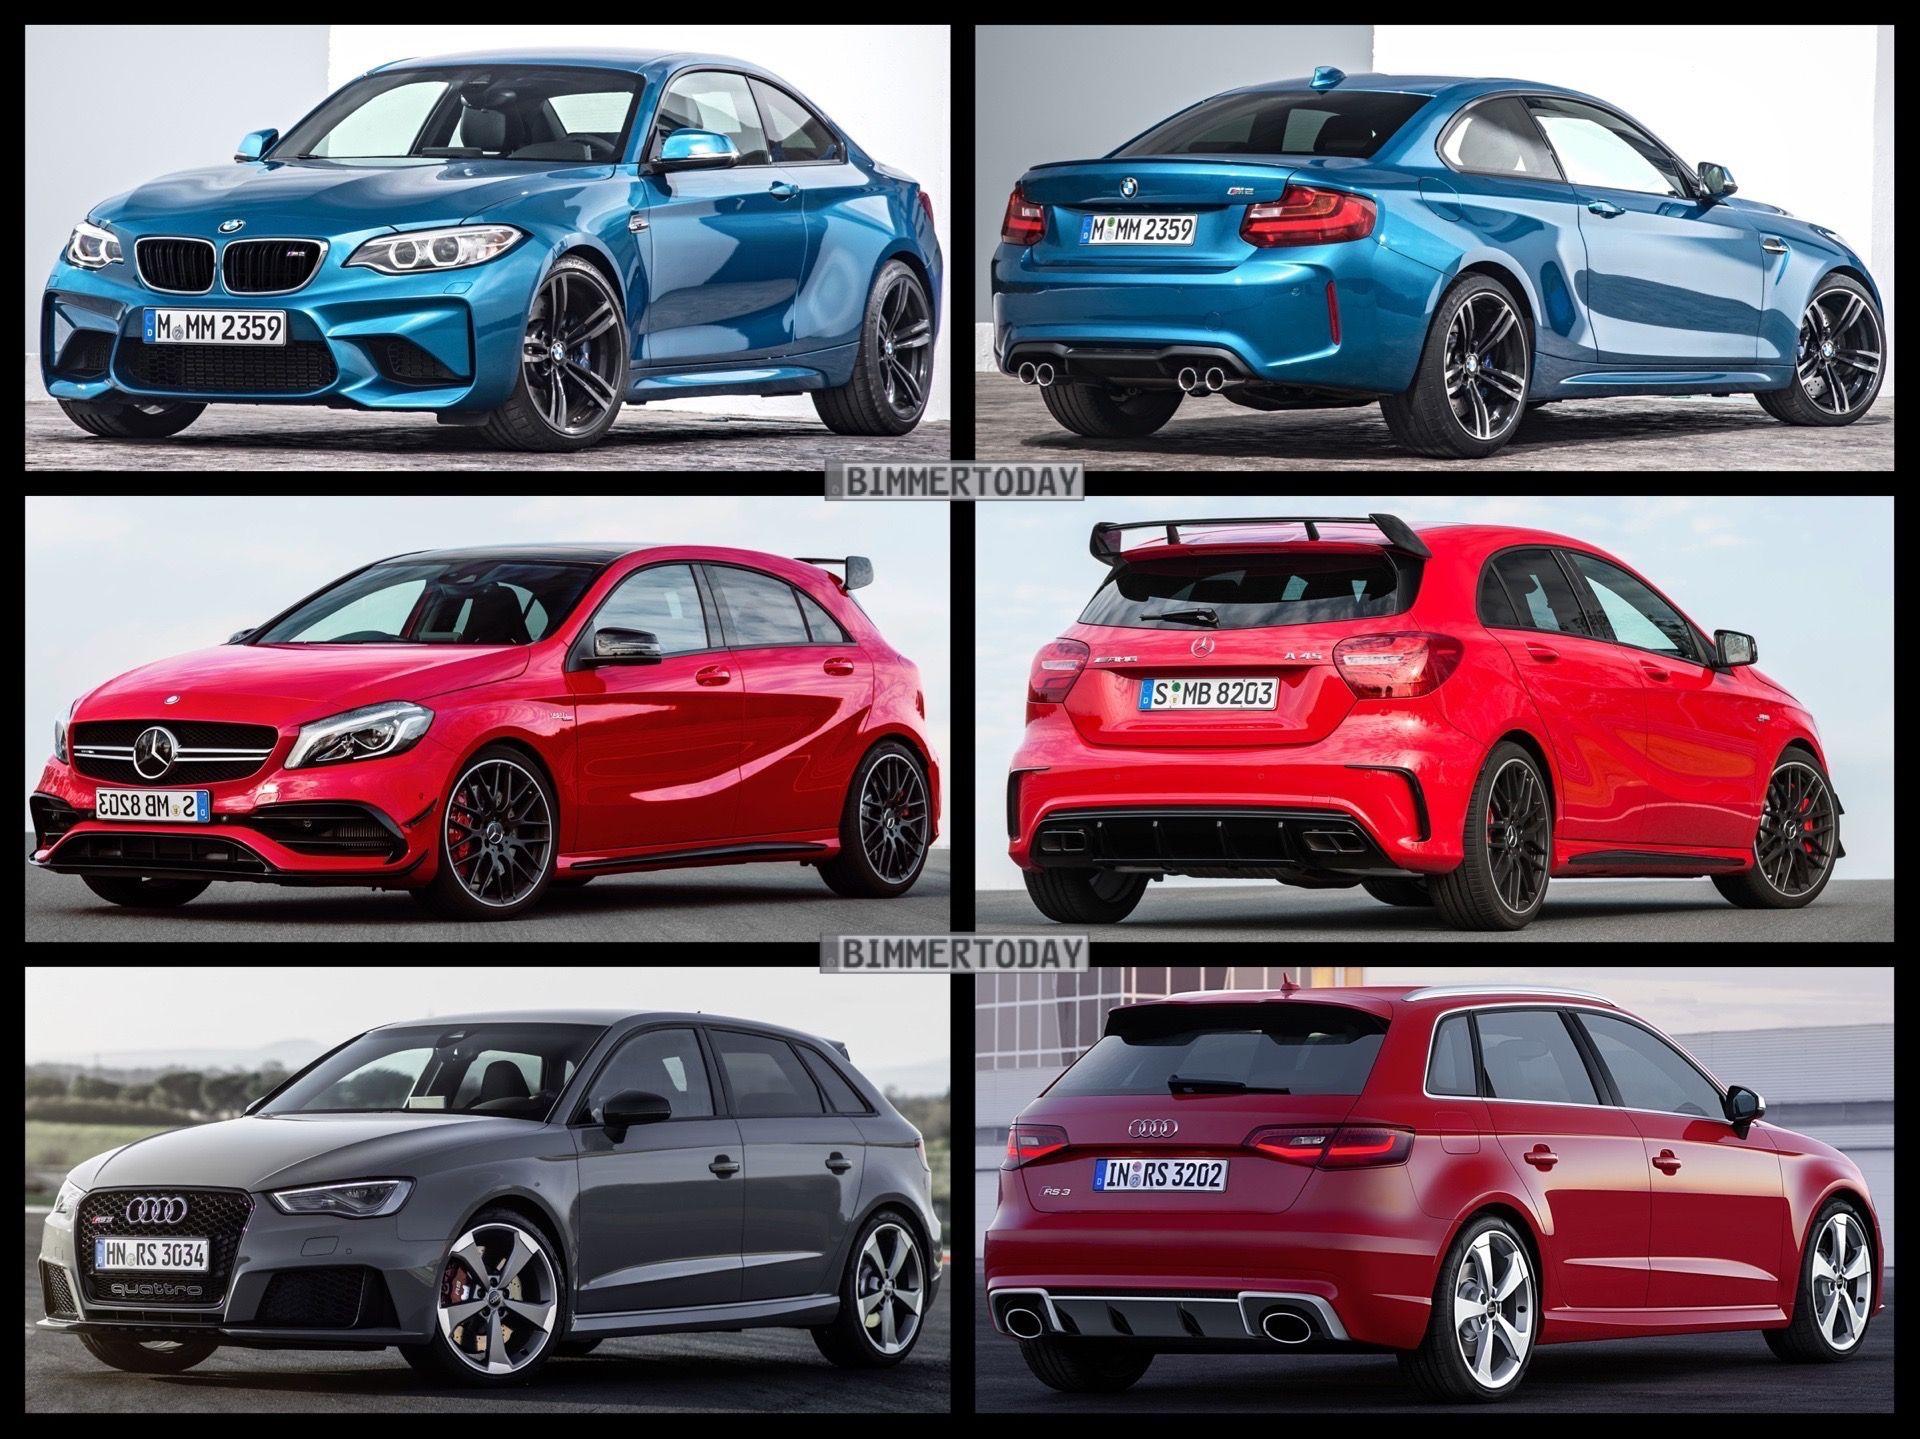 Bmw M2 Vs Mercedes Amg A45 Vs Audi Rs3 Comparison Mercedes